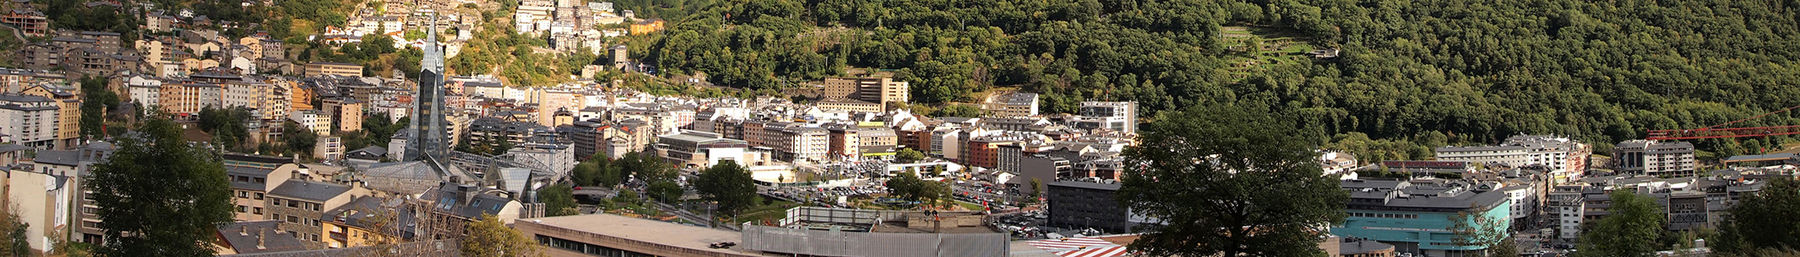 Andorra la Vella banner.jpg